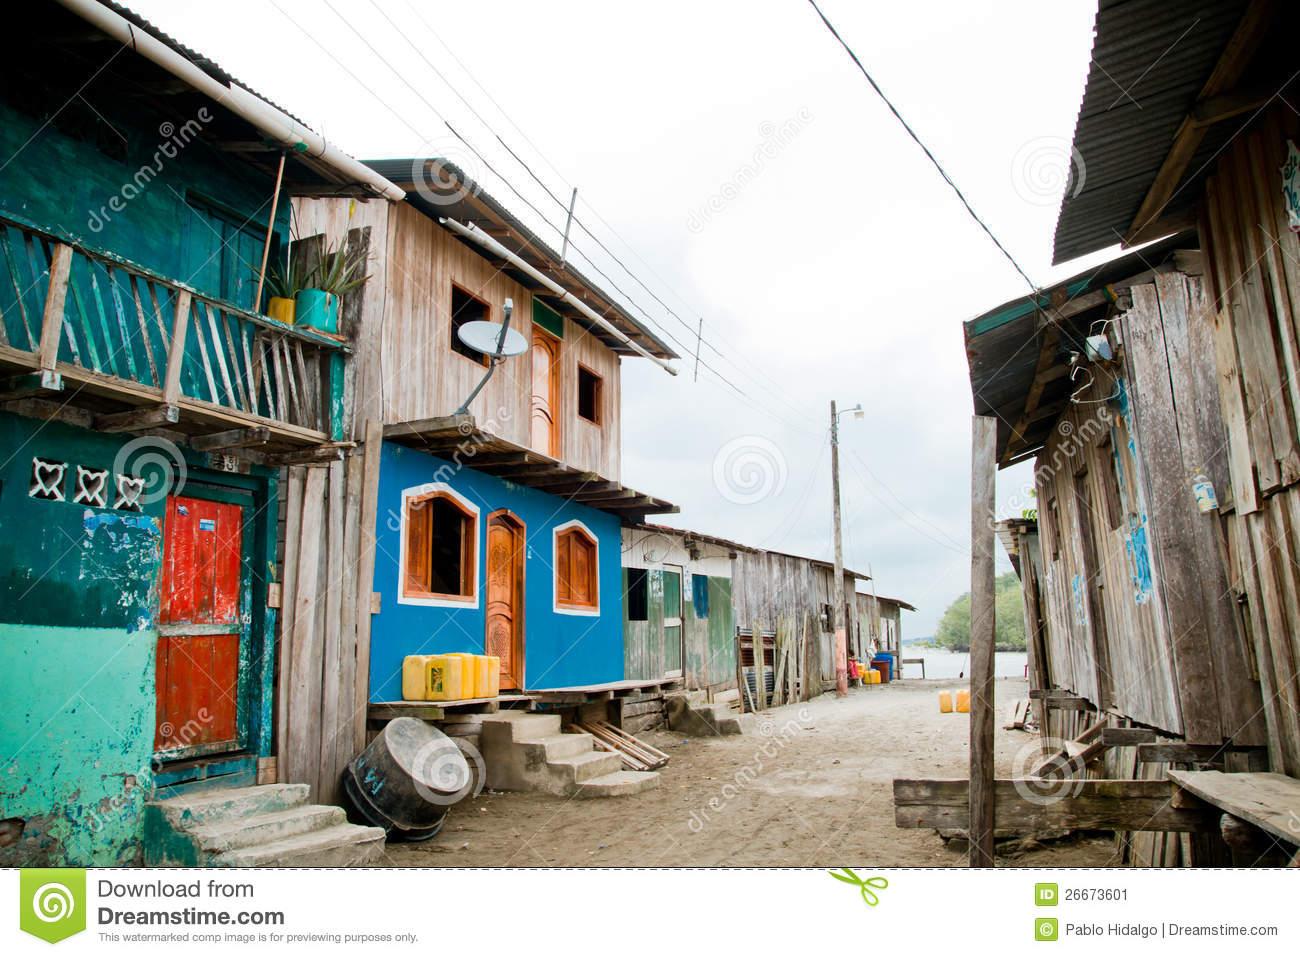 Third World Neighborhood Colorful Houses Stock Photos, Images.